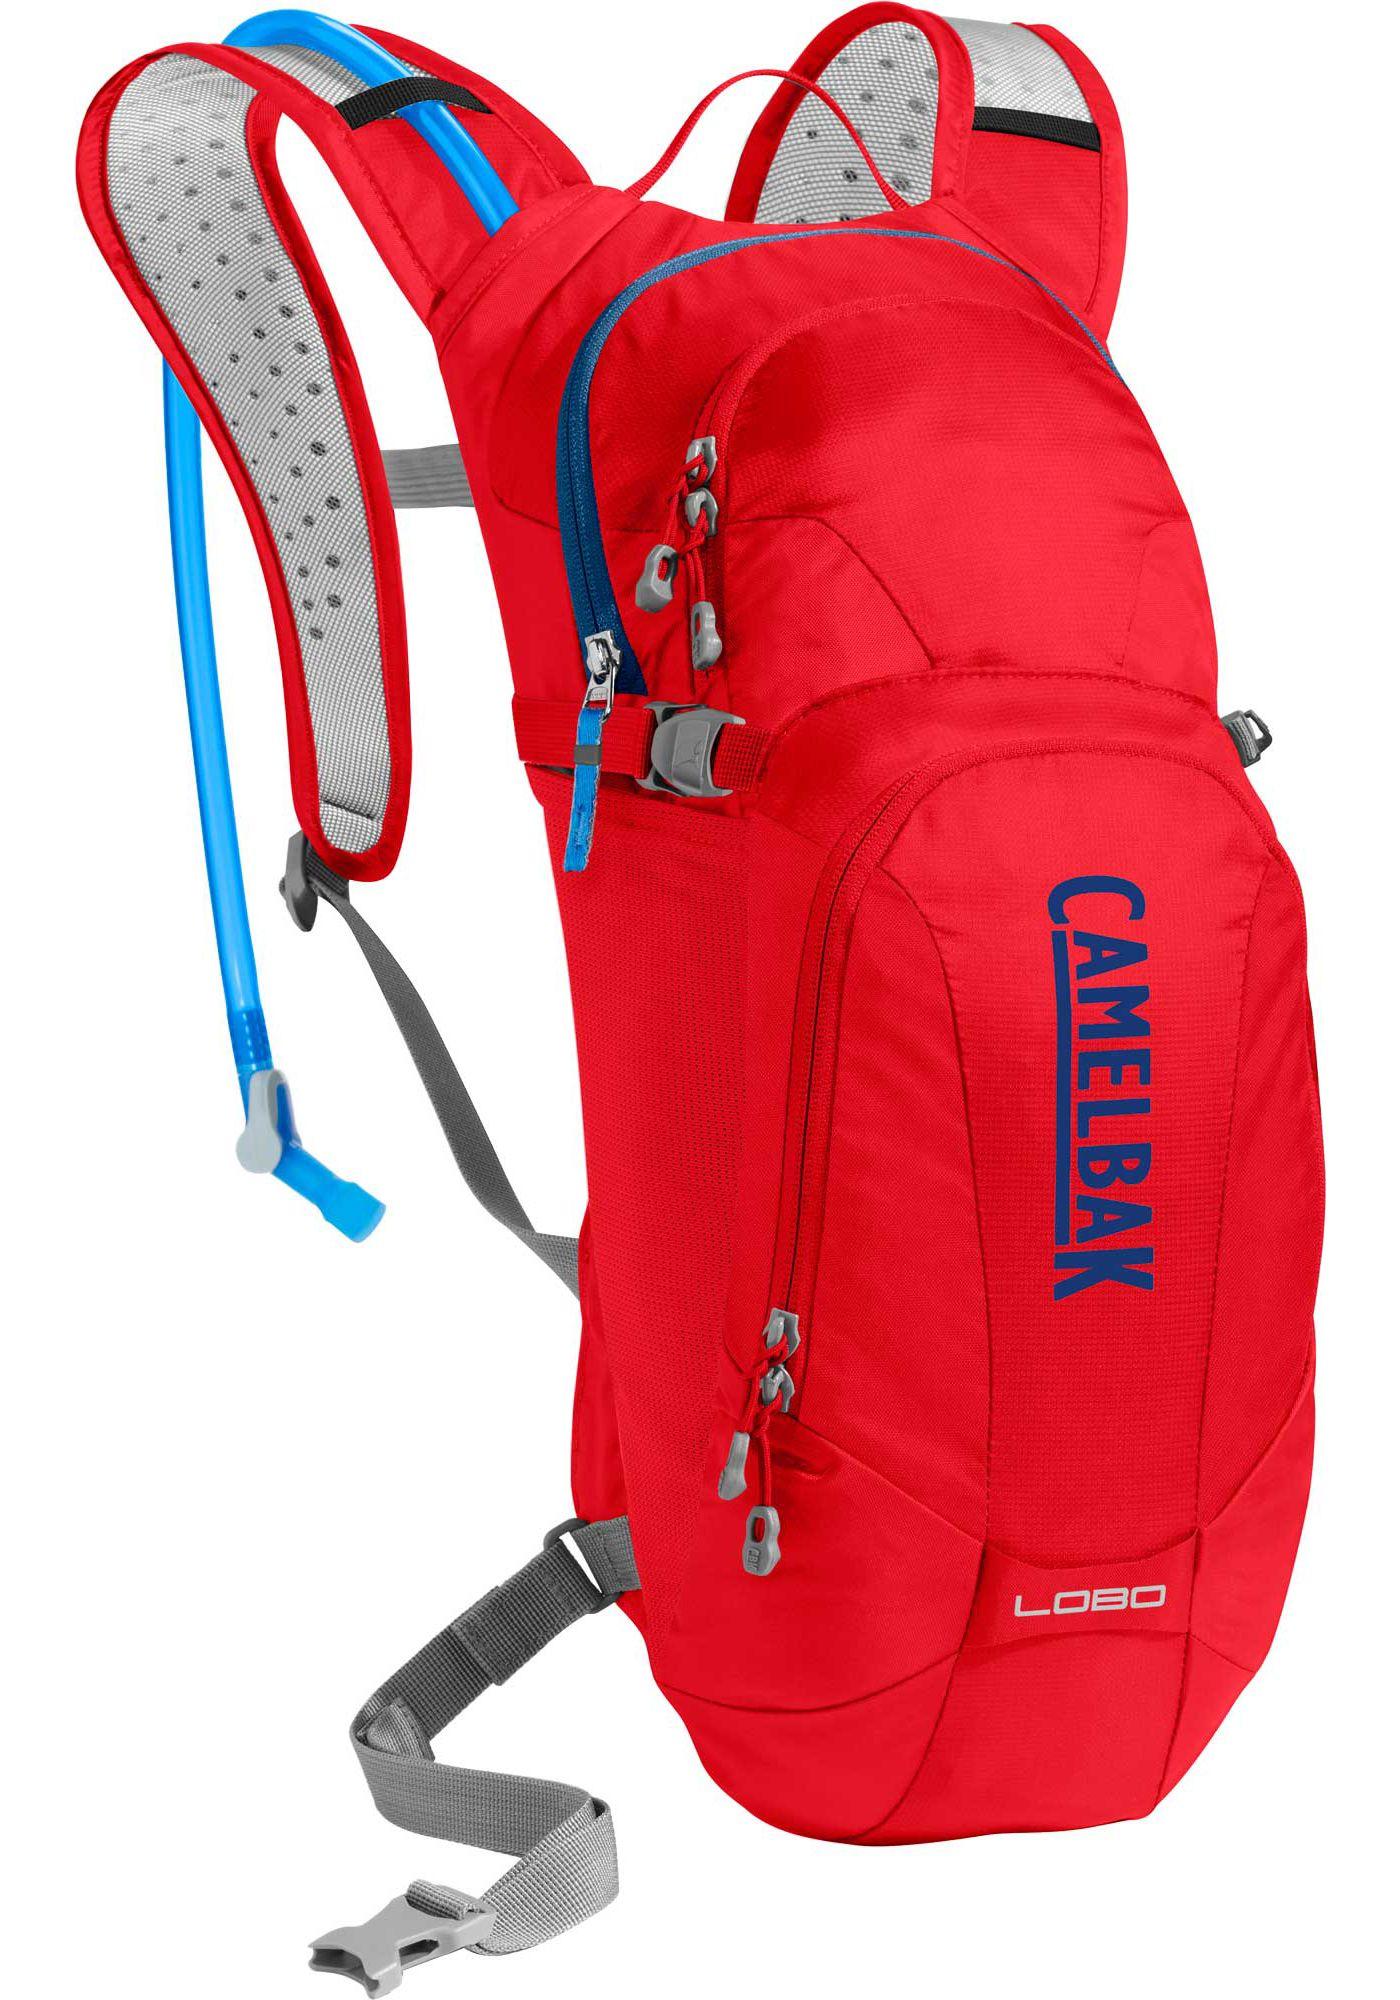 CamelBak Lobo 100 oz. Hydration Pack